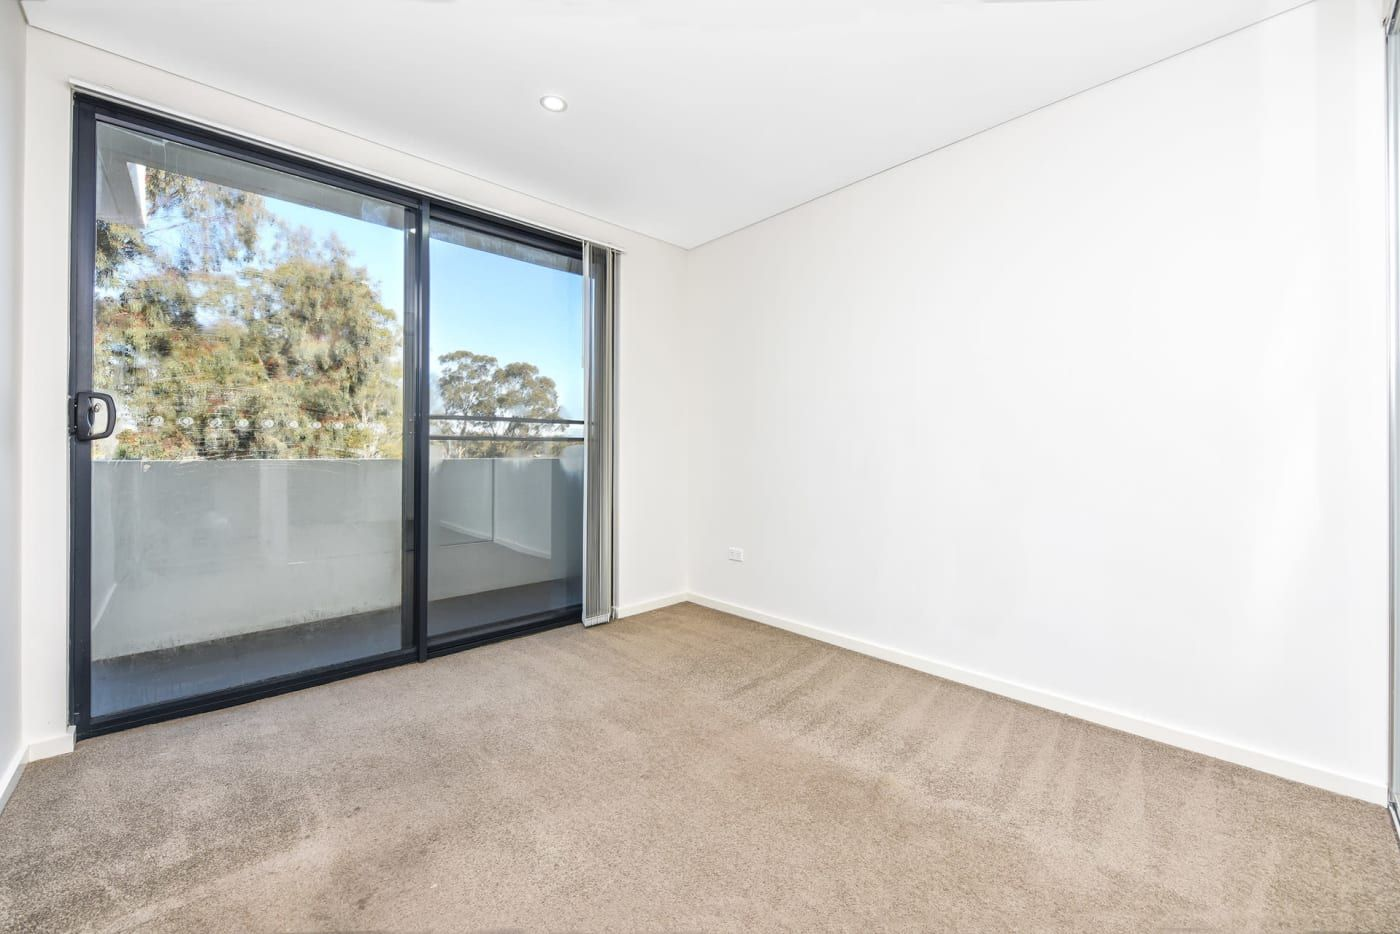 24/8-10 Octavia Street, Toongabbie NSW 2146, Image 1